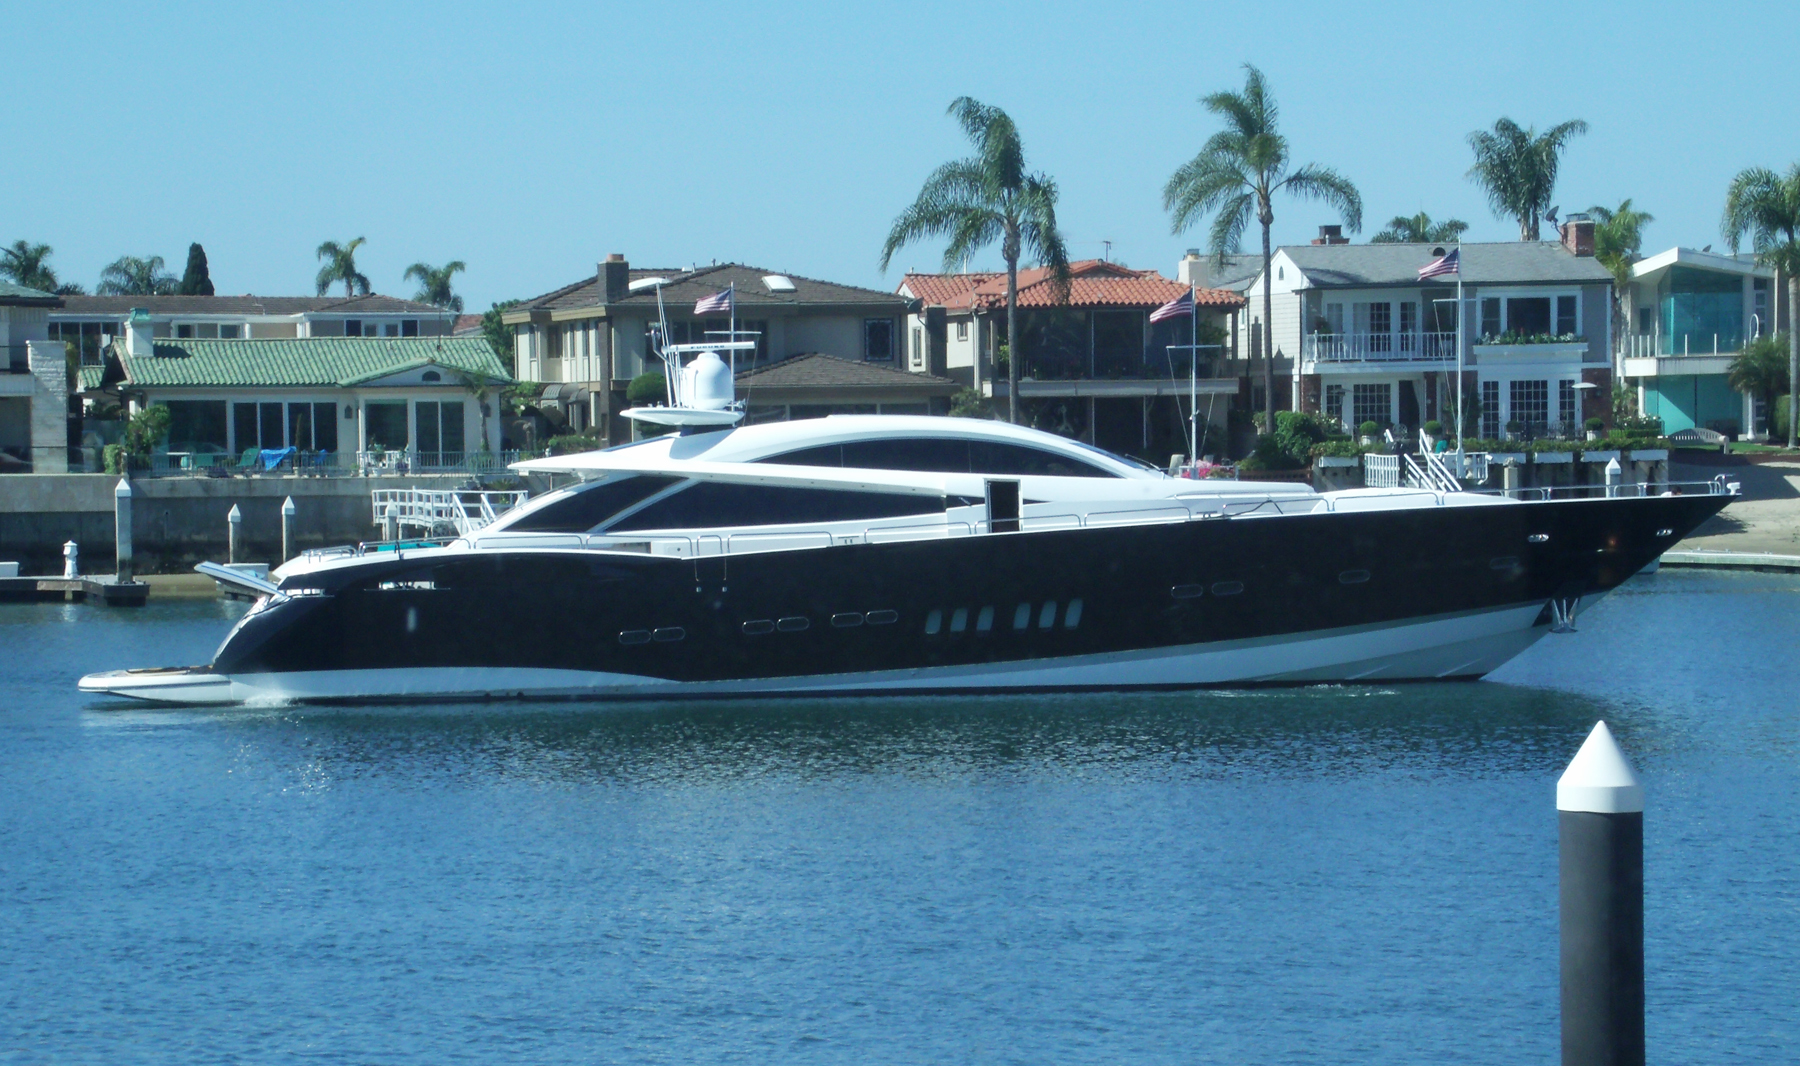 Sunseeker Yacht Argo Featured At Newport Boat Show